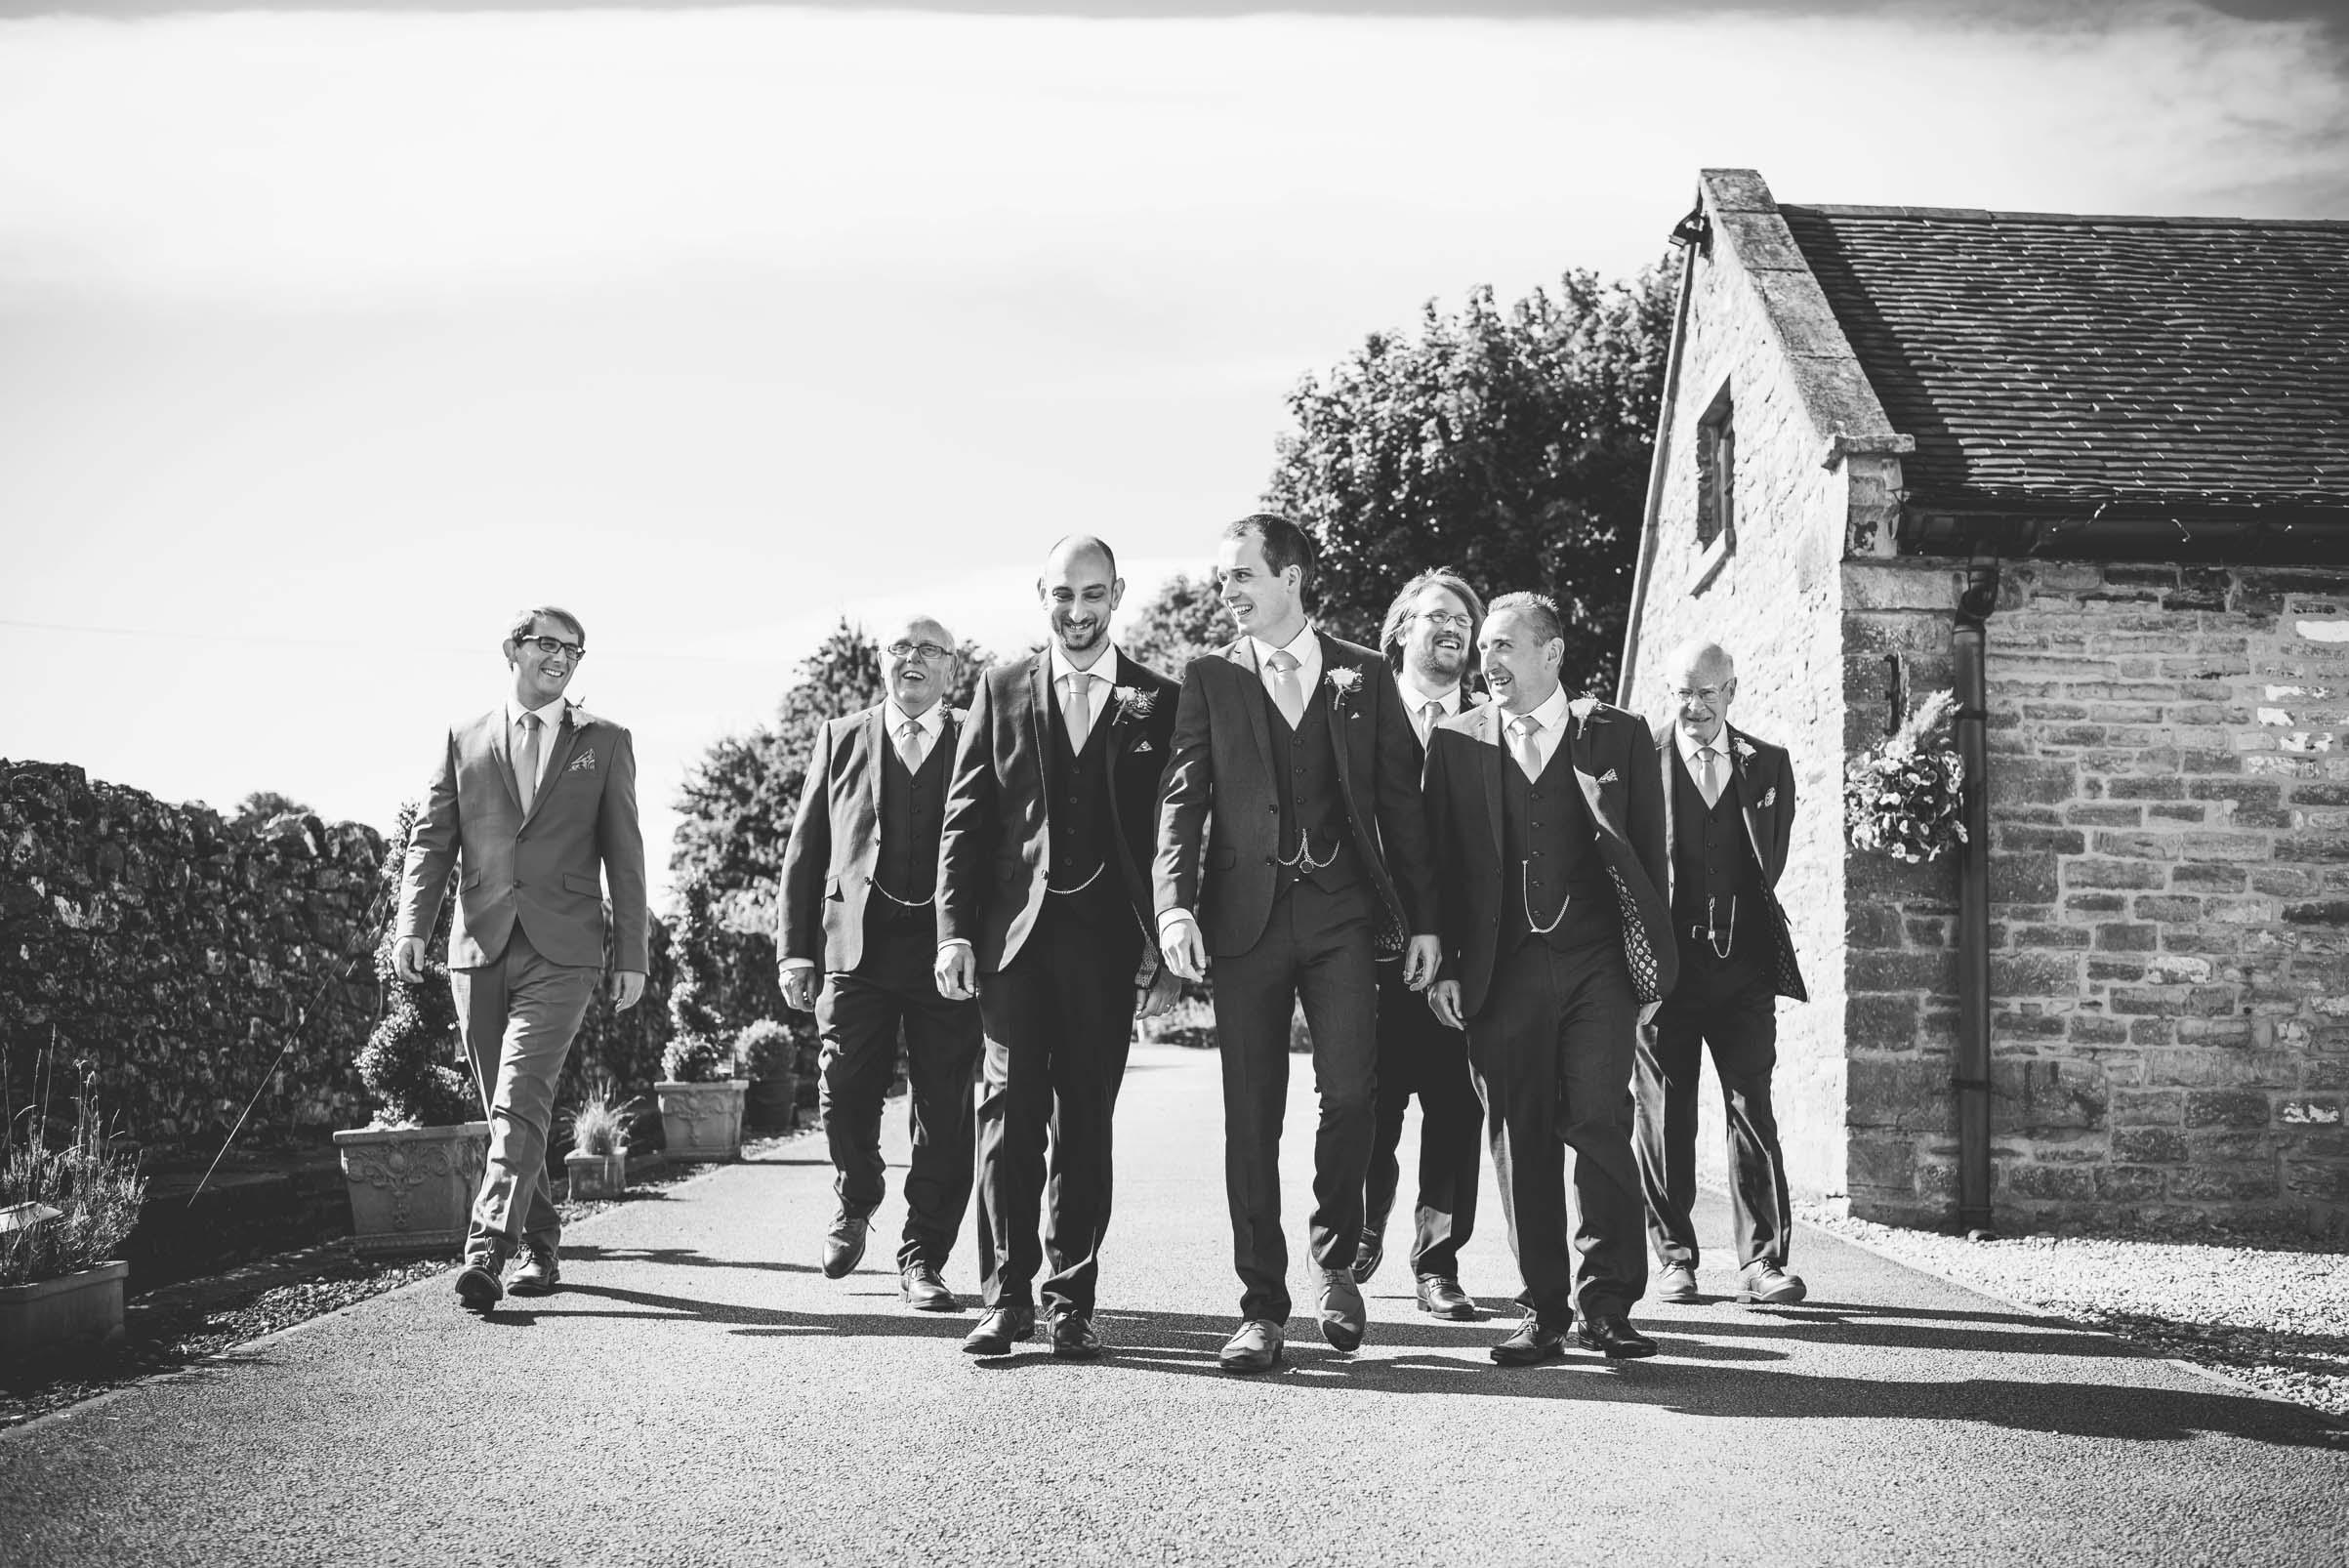 Peak+district+farm+wedding+lower+damgate+photographer-65.jpg